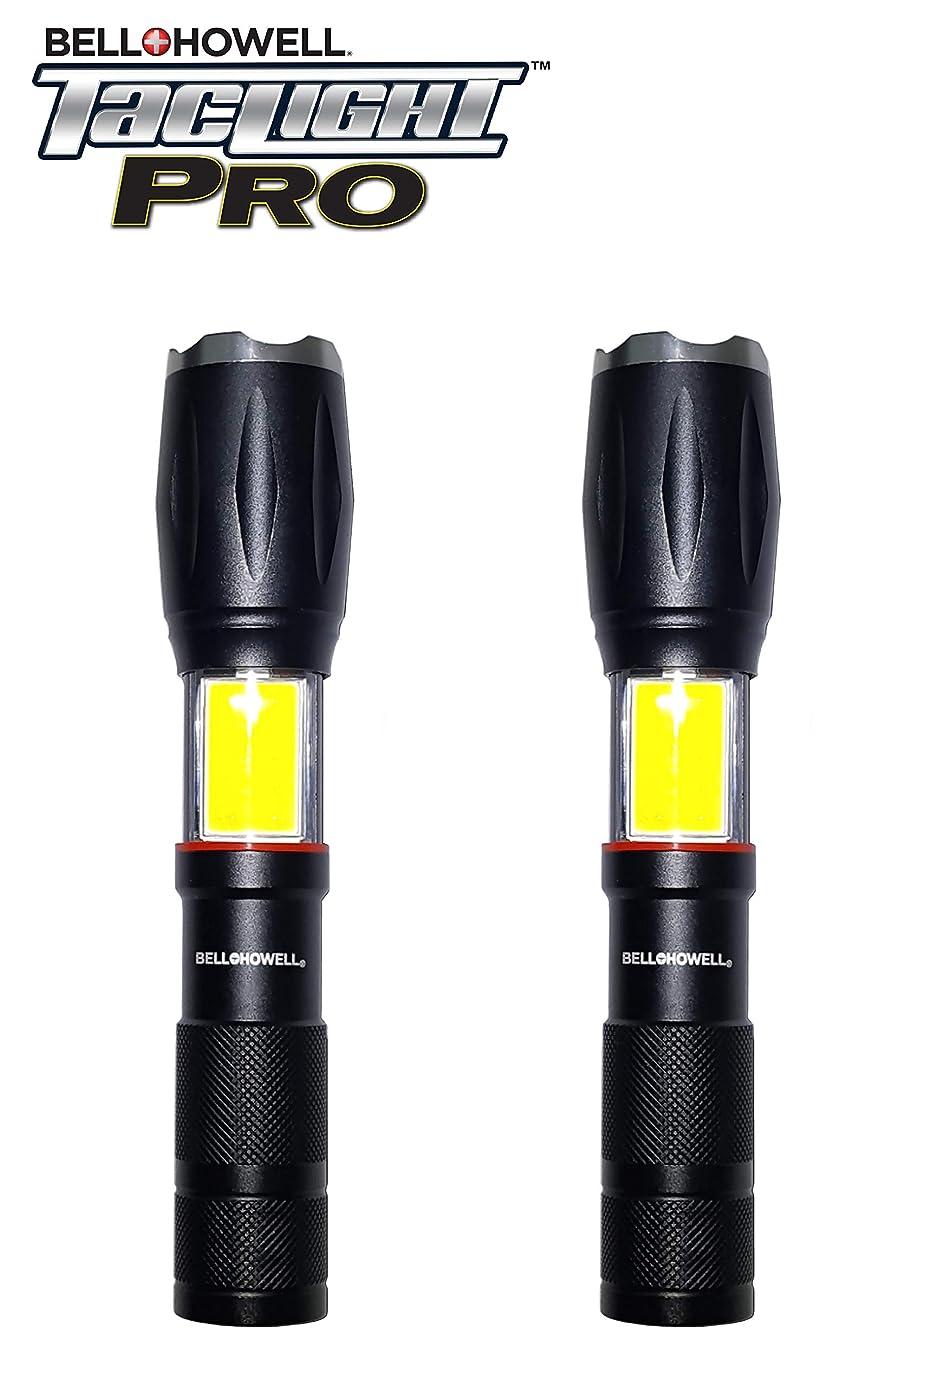 Bell + Howell TACLIGHT PRO Lantern Flashlight - 40x Brightness - with Zoom, Magnetic Base (Set of 2)